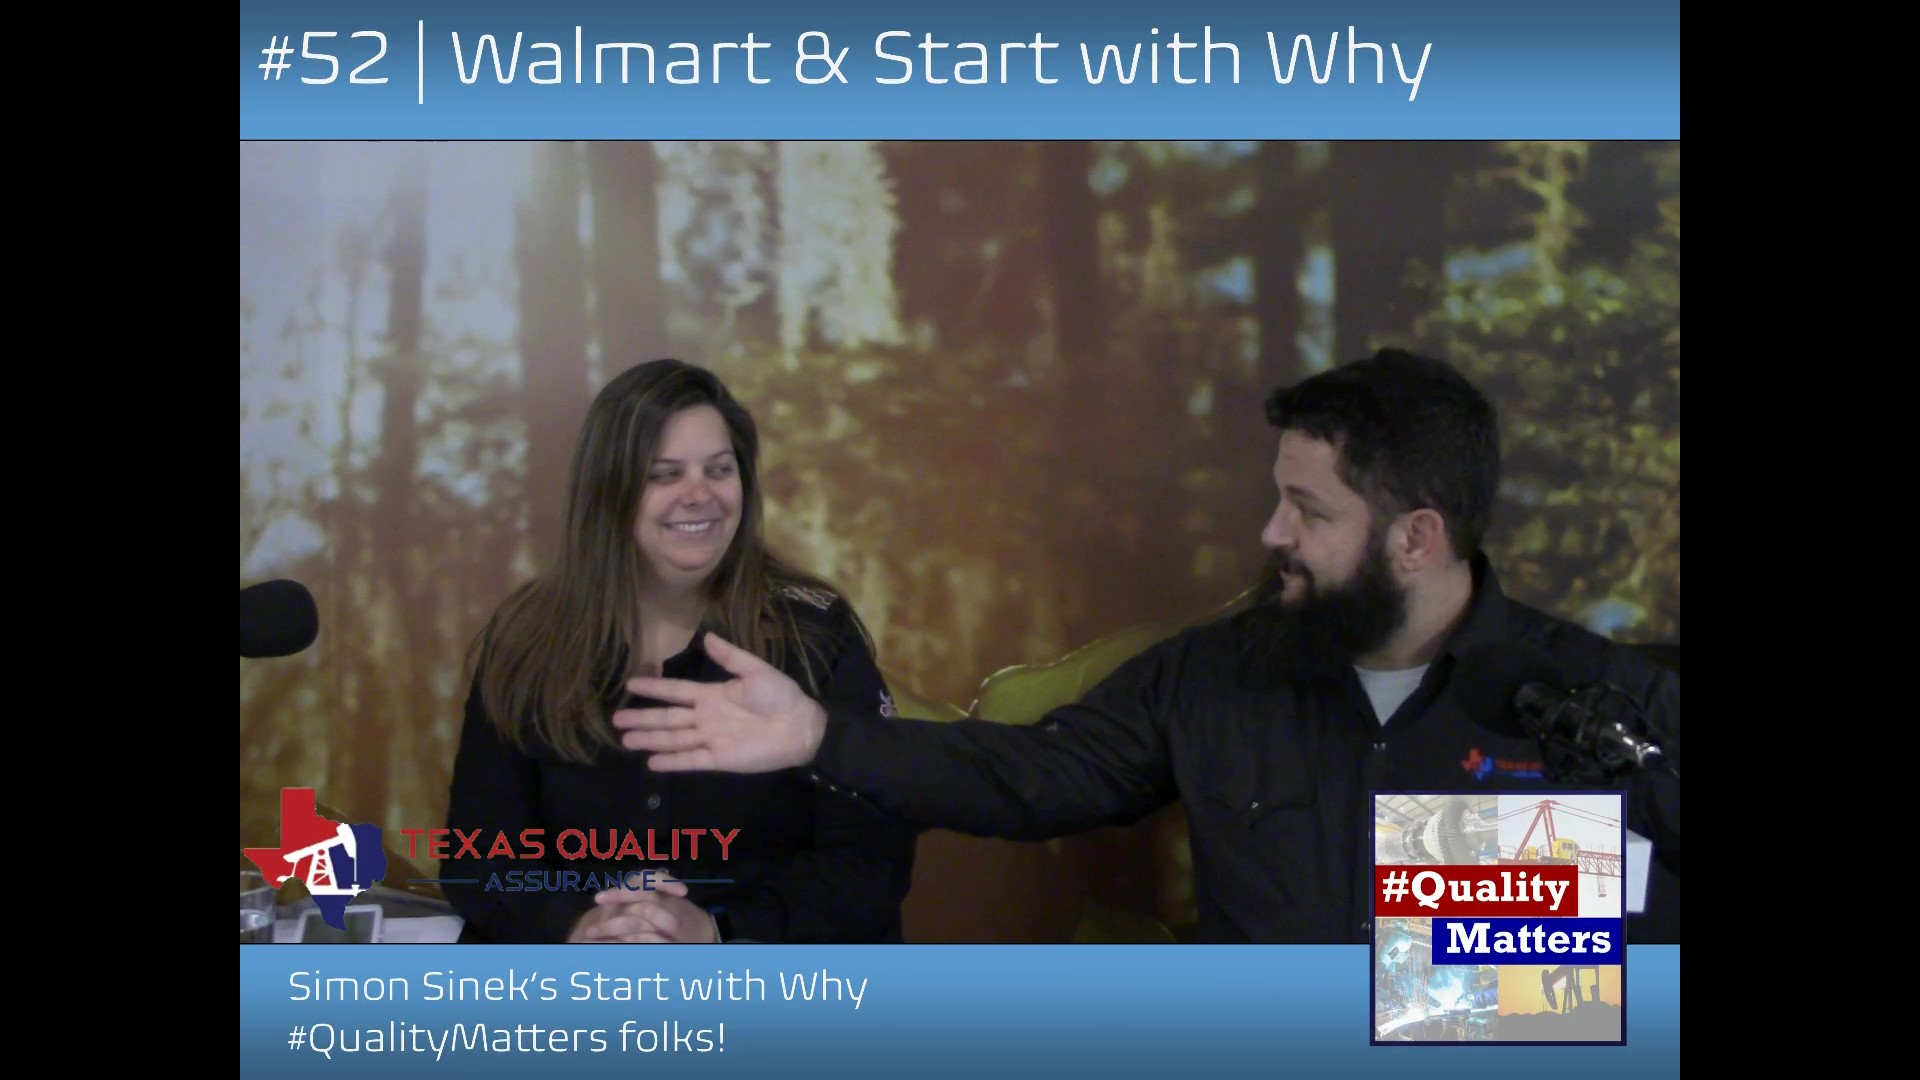 Same Walton, Walmart & Start with Why